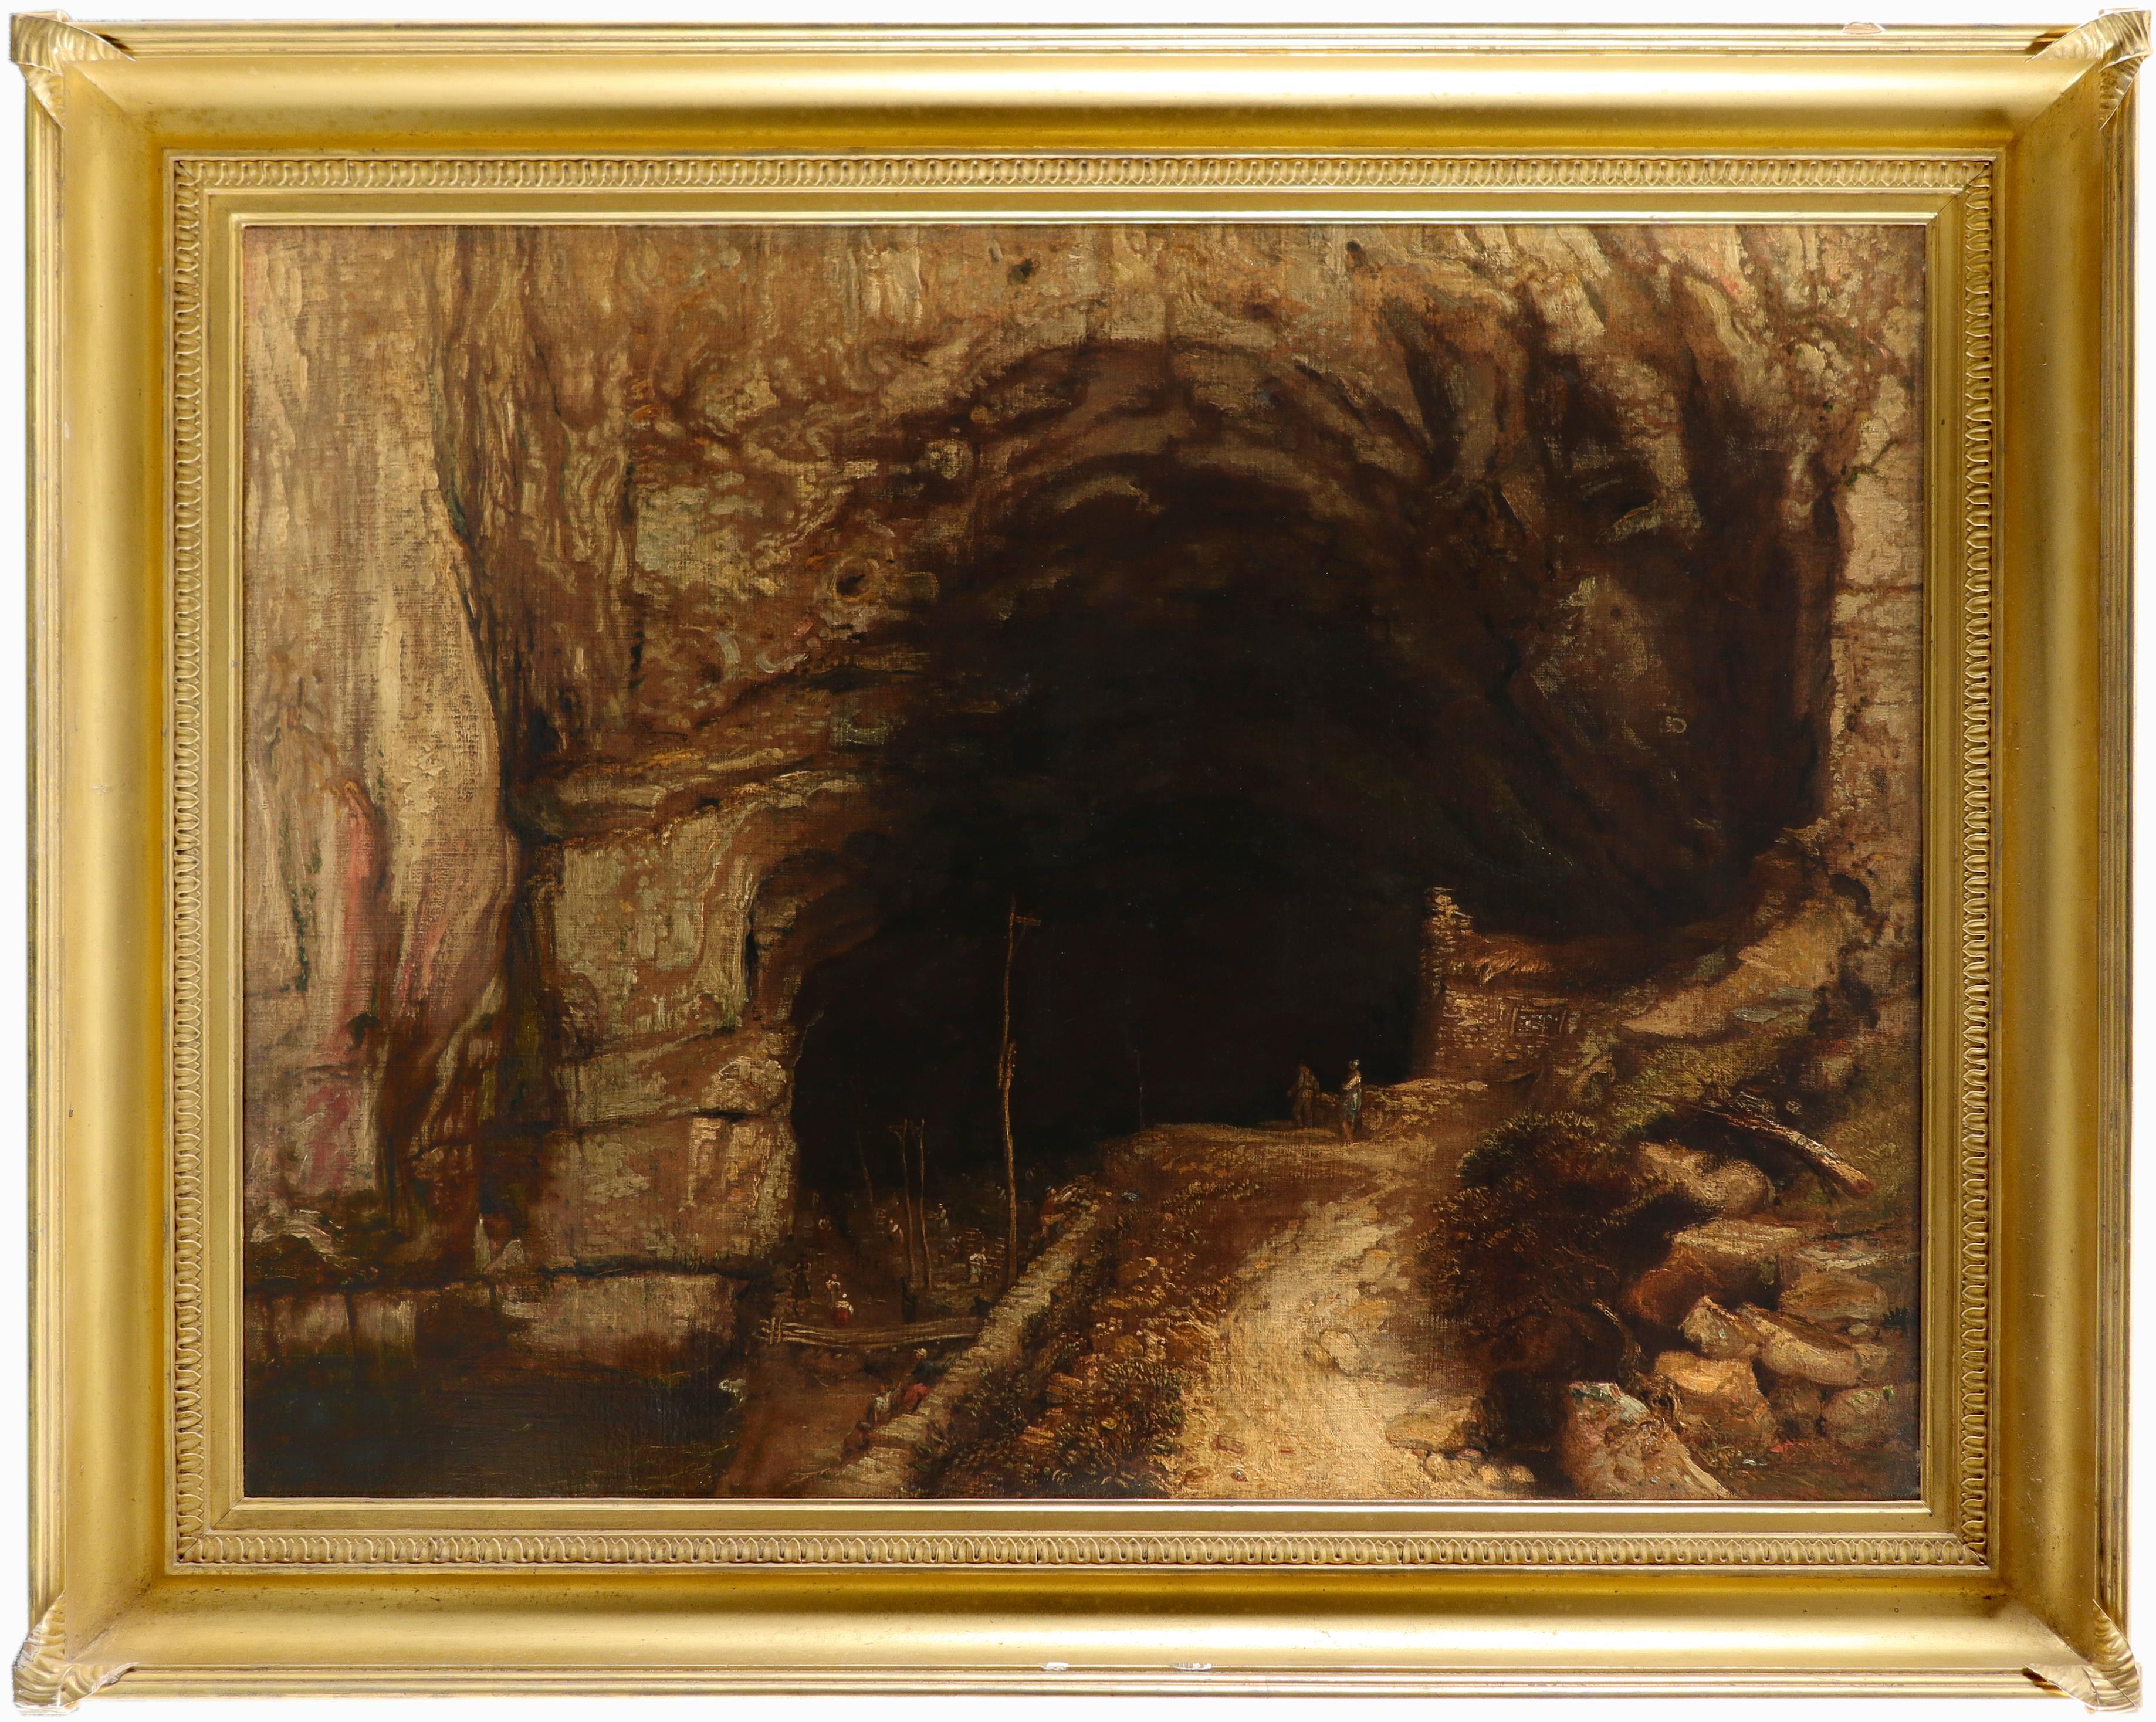 James Ward RA (1769-1859) Peak Cavern, Castleton, Derbyshire Signed with monogram and dated 1835 - Image 2 of 3